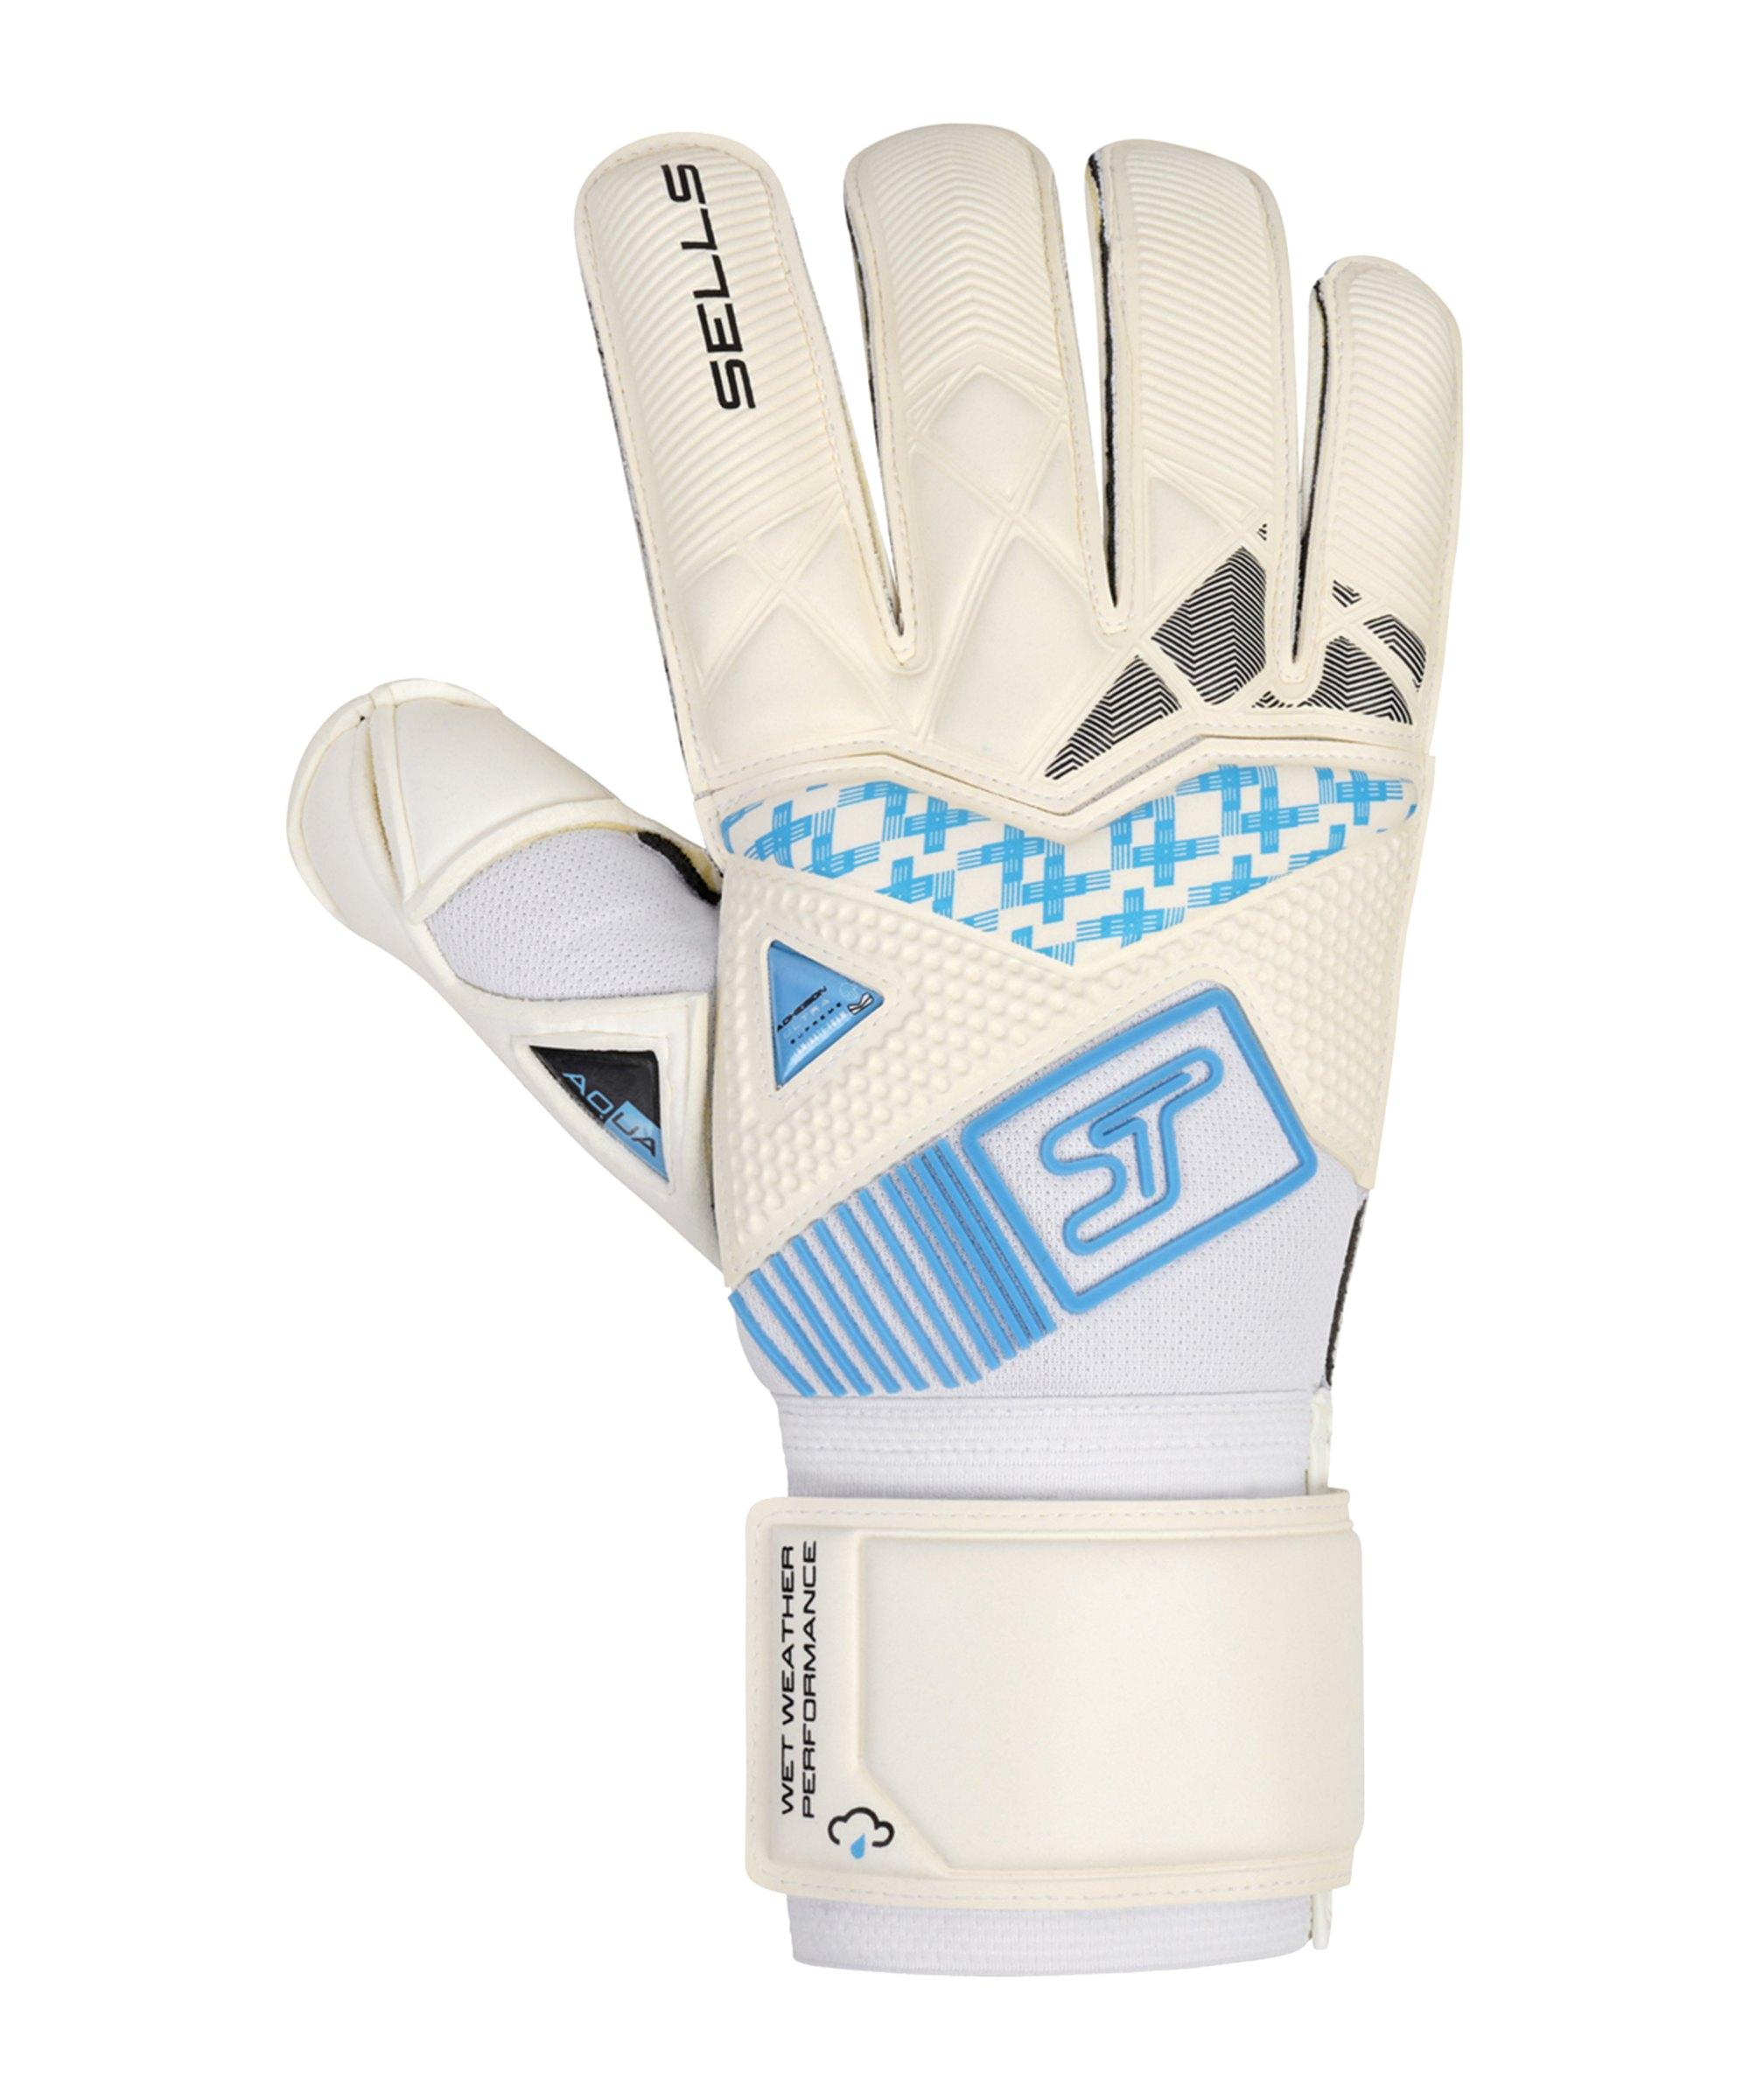 Sells Wrap Aqua H20 TW-Handschuh Weiss Schwarz Blau - weiss